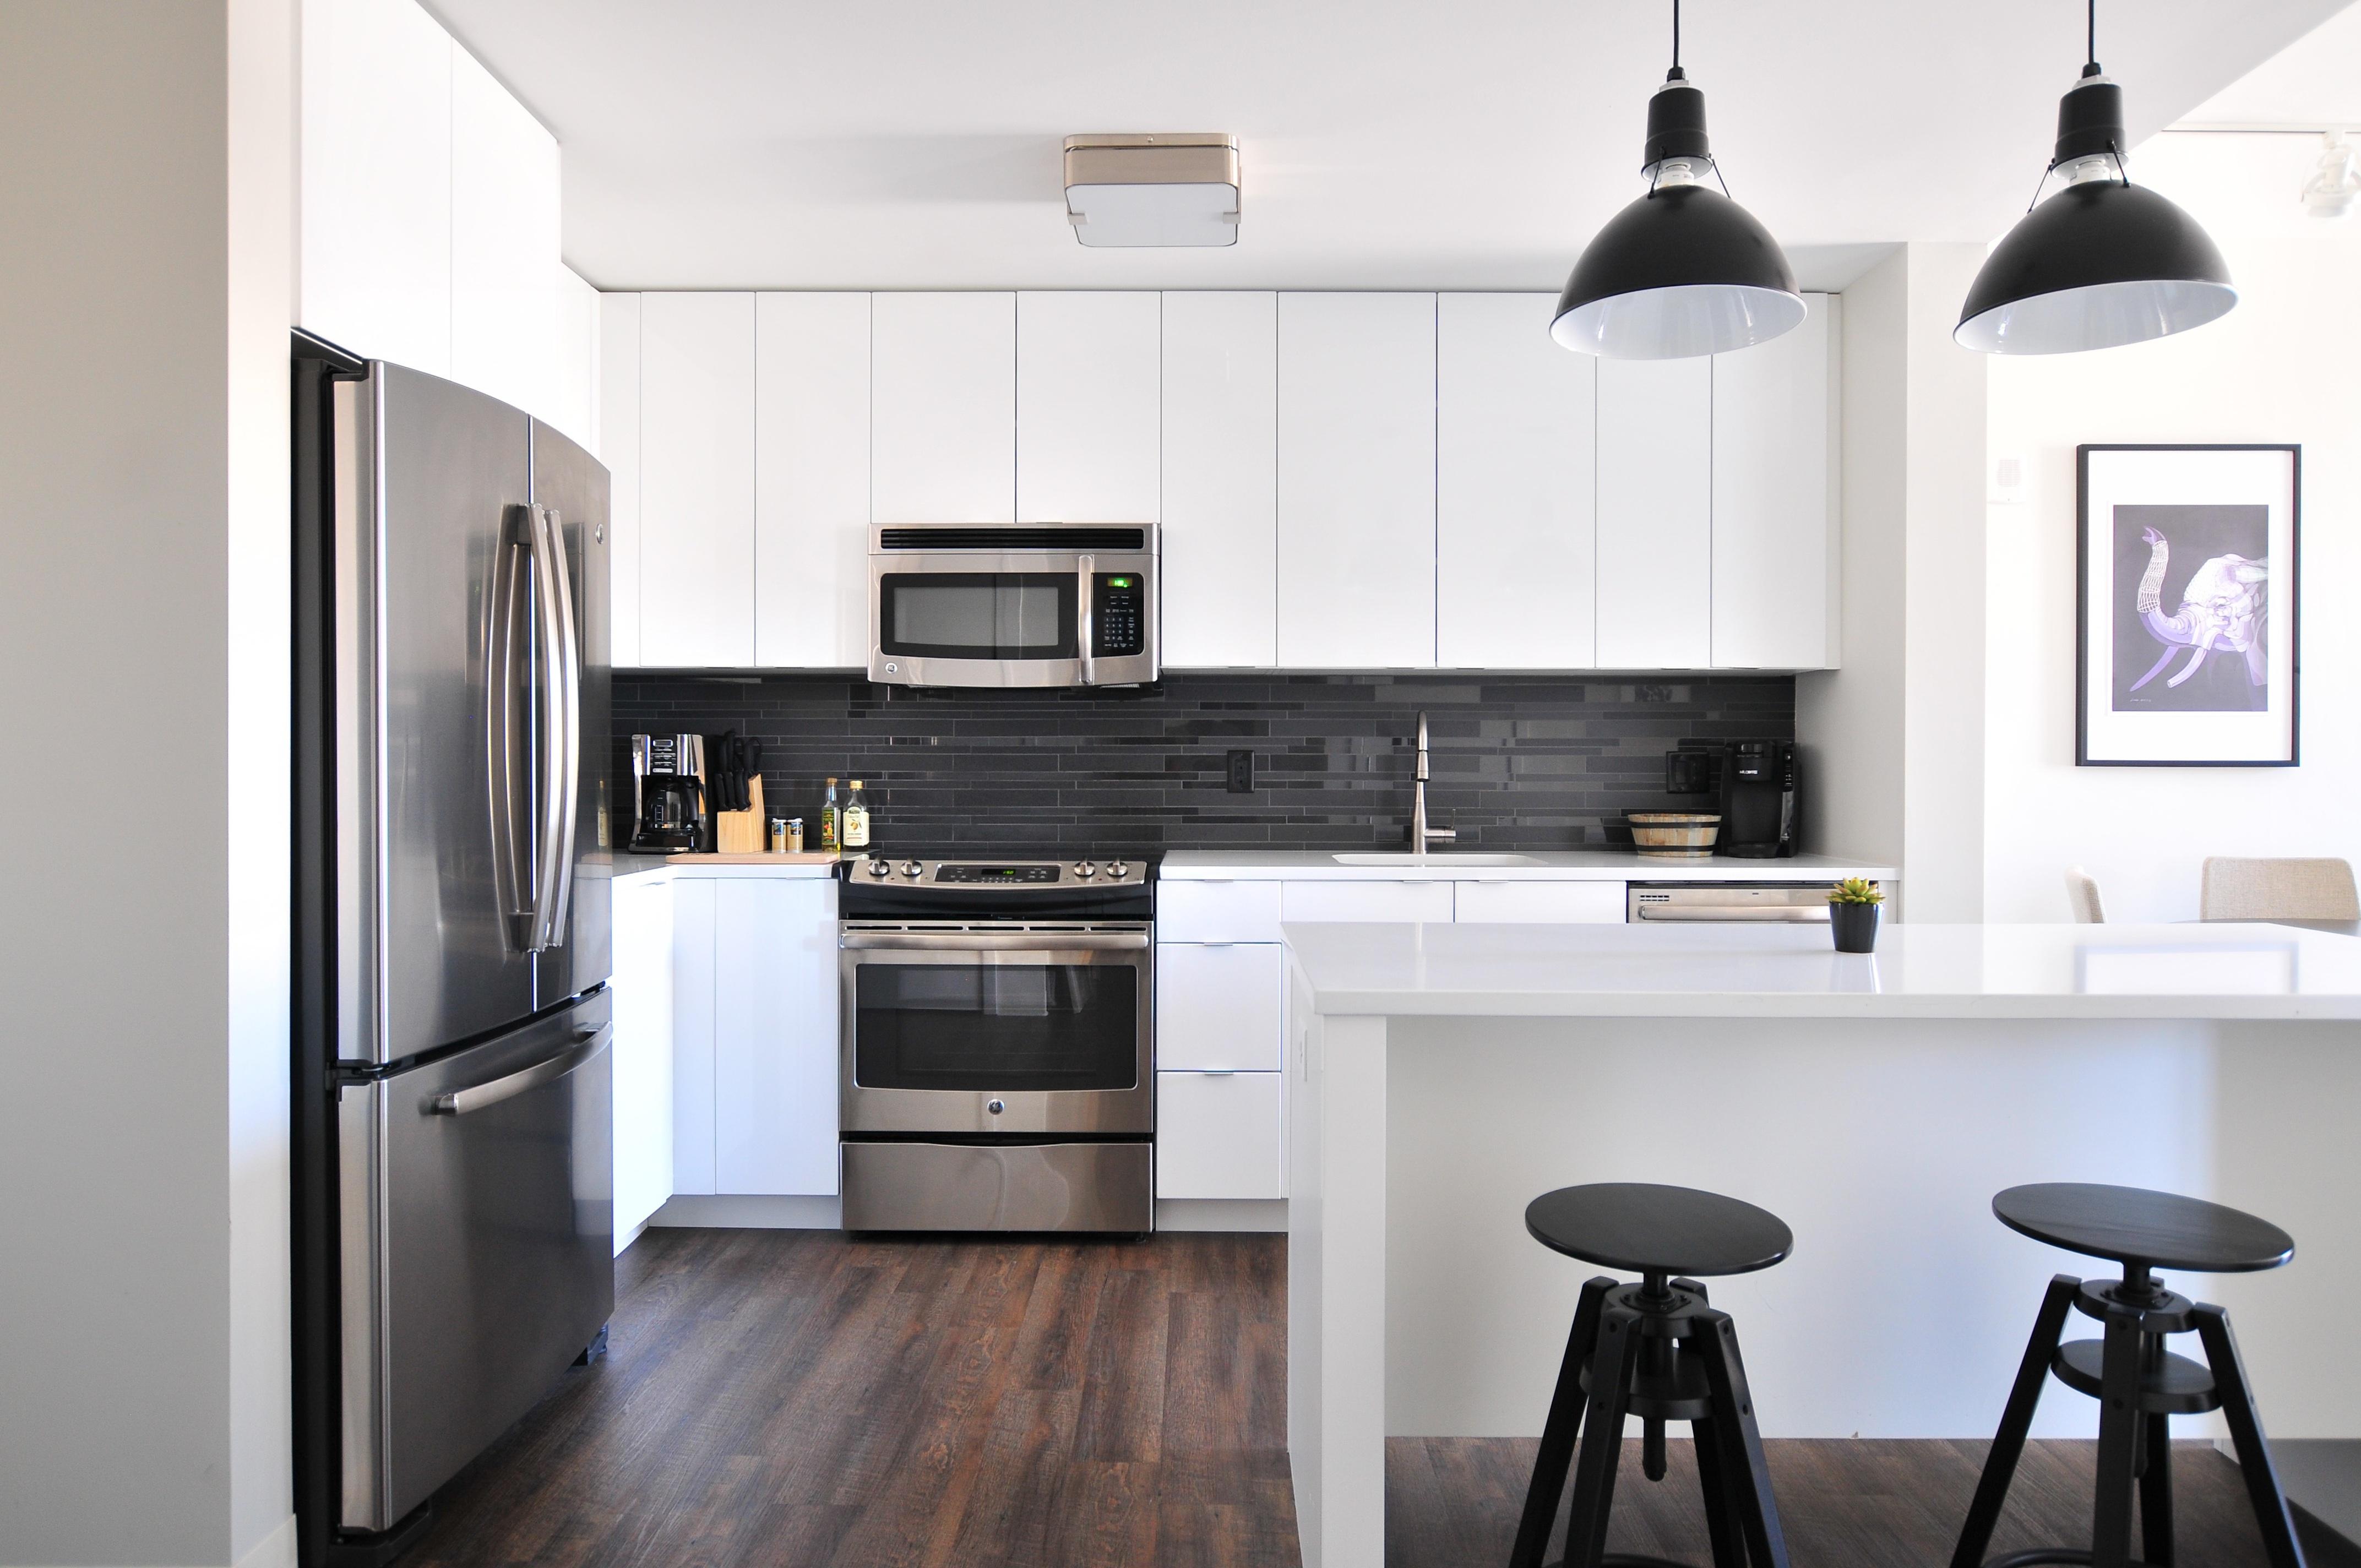 prepara tu cocina decorada para airbnb